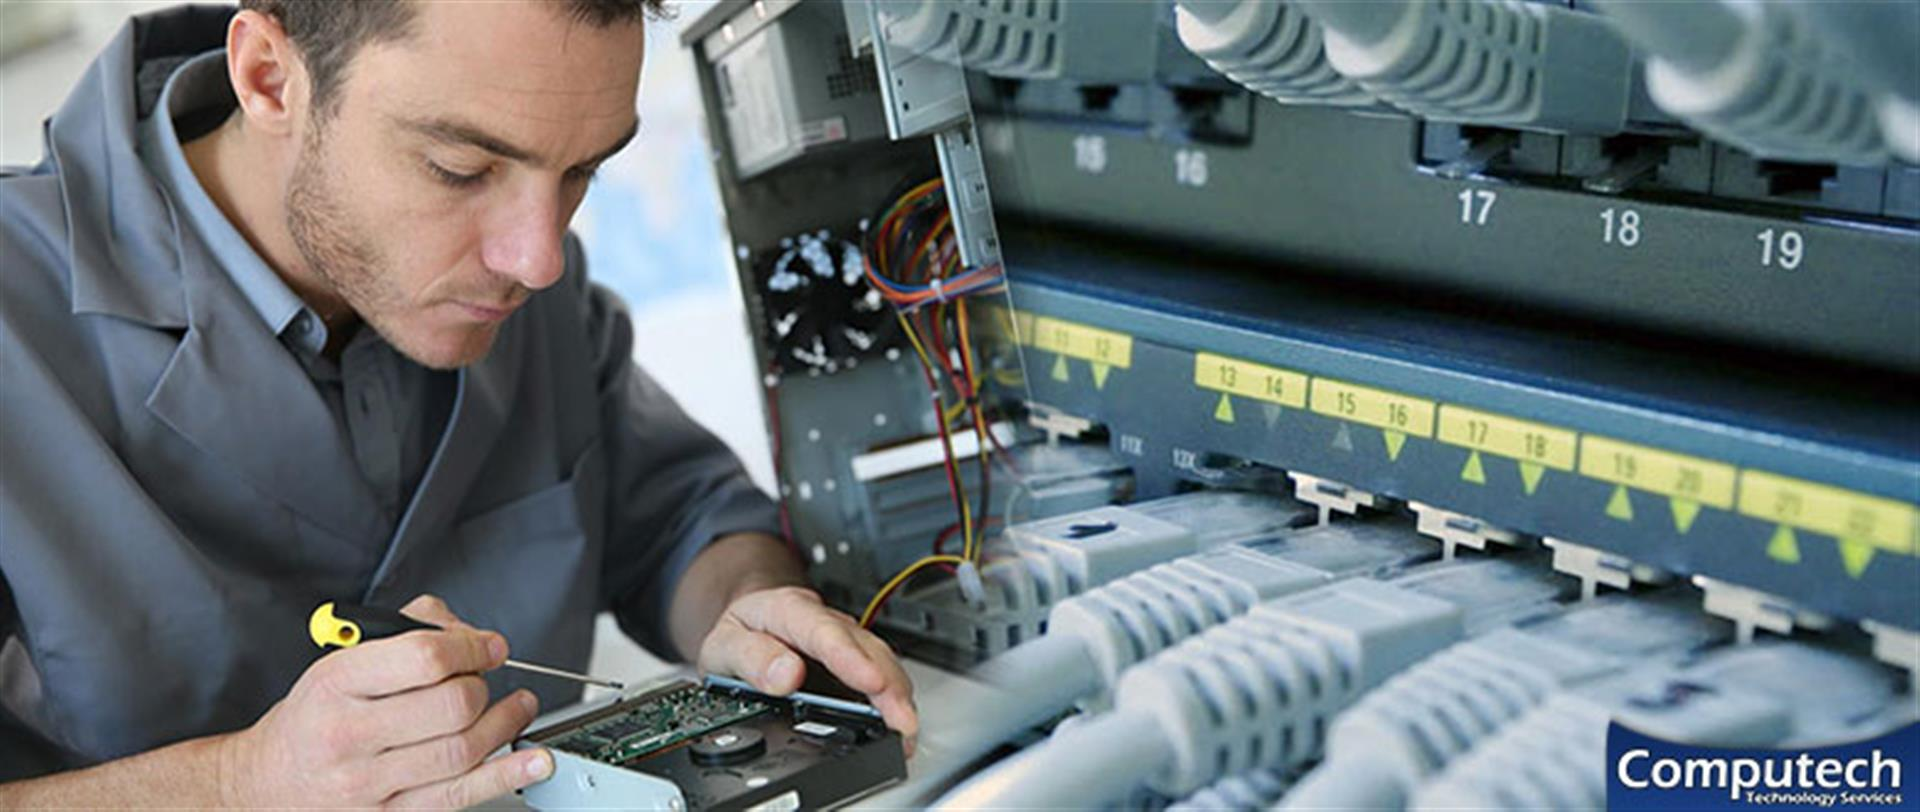 Hampton Virginia On-Site PC & Printer Repairs, Network, Voice & Data Cabling Contractors